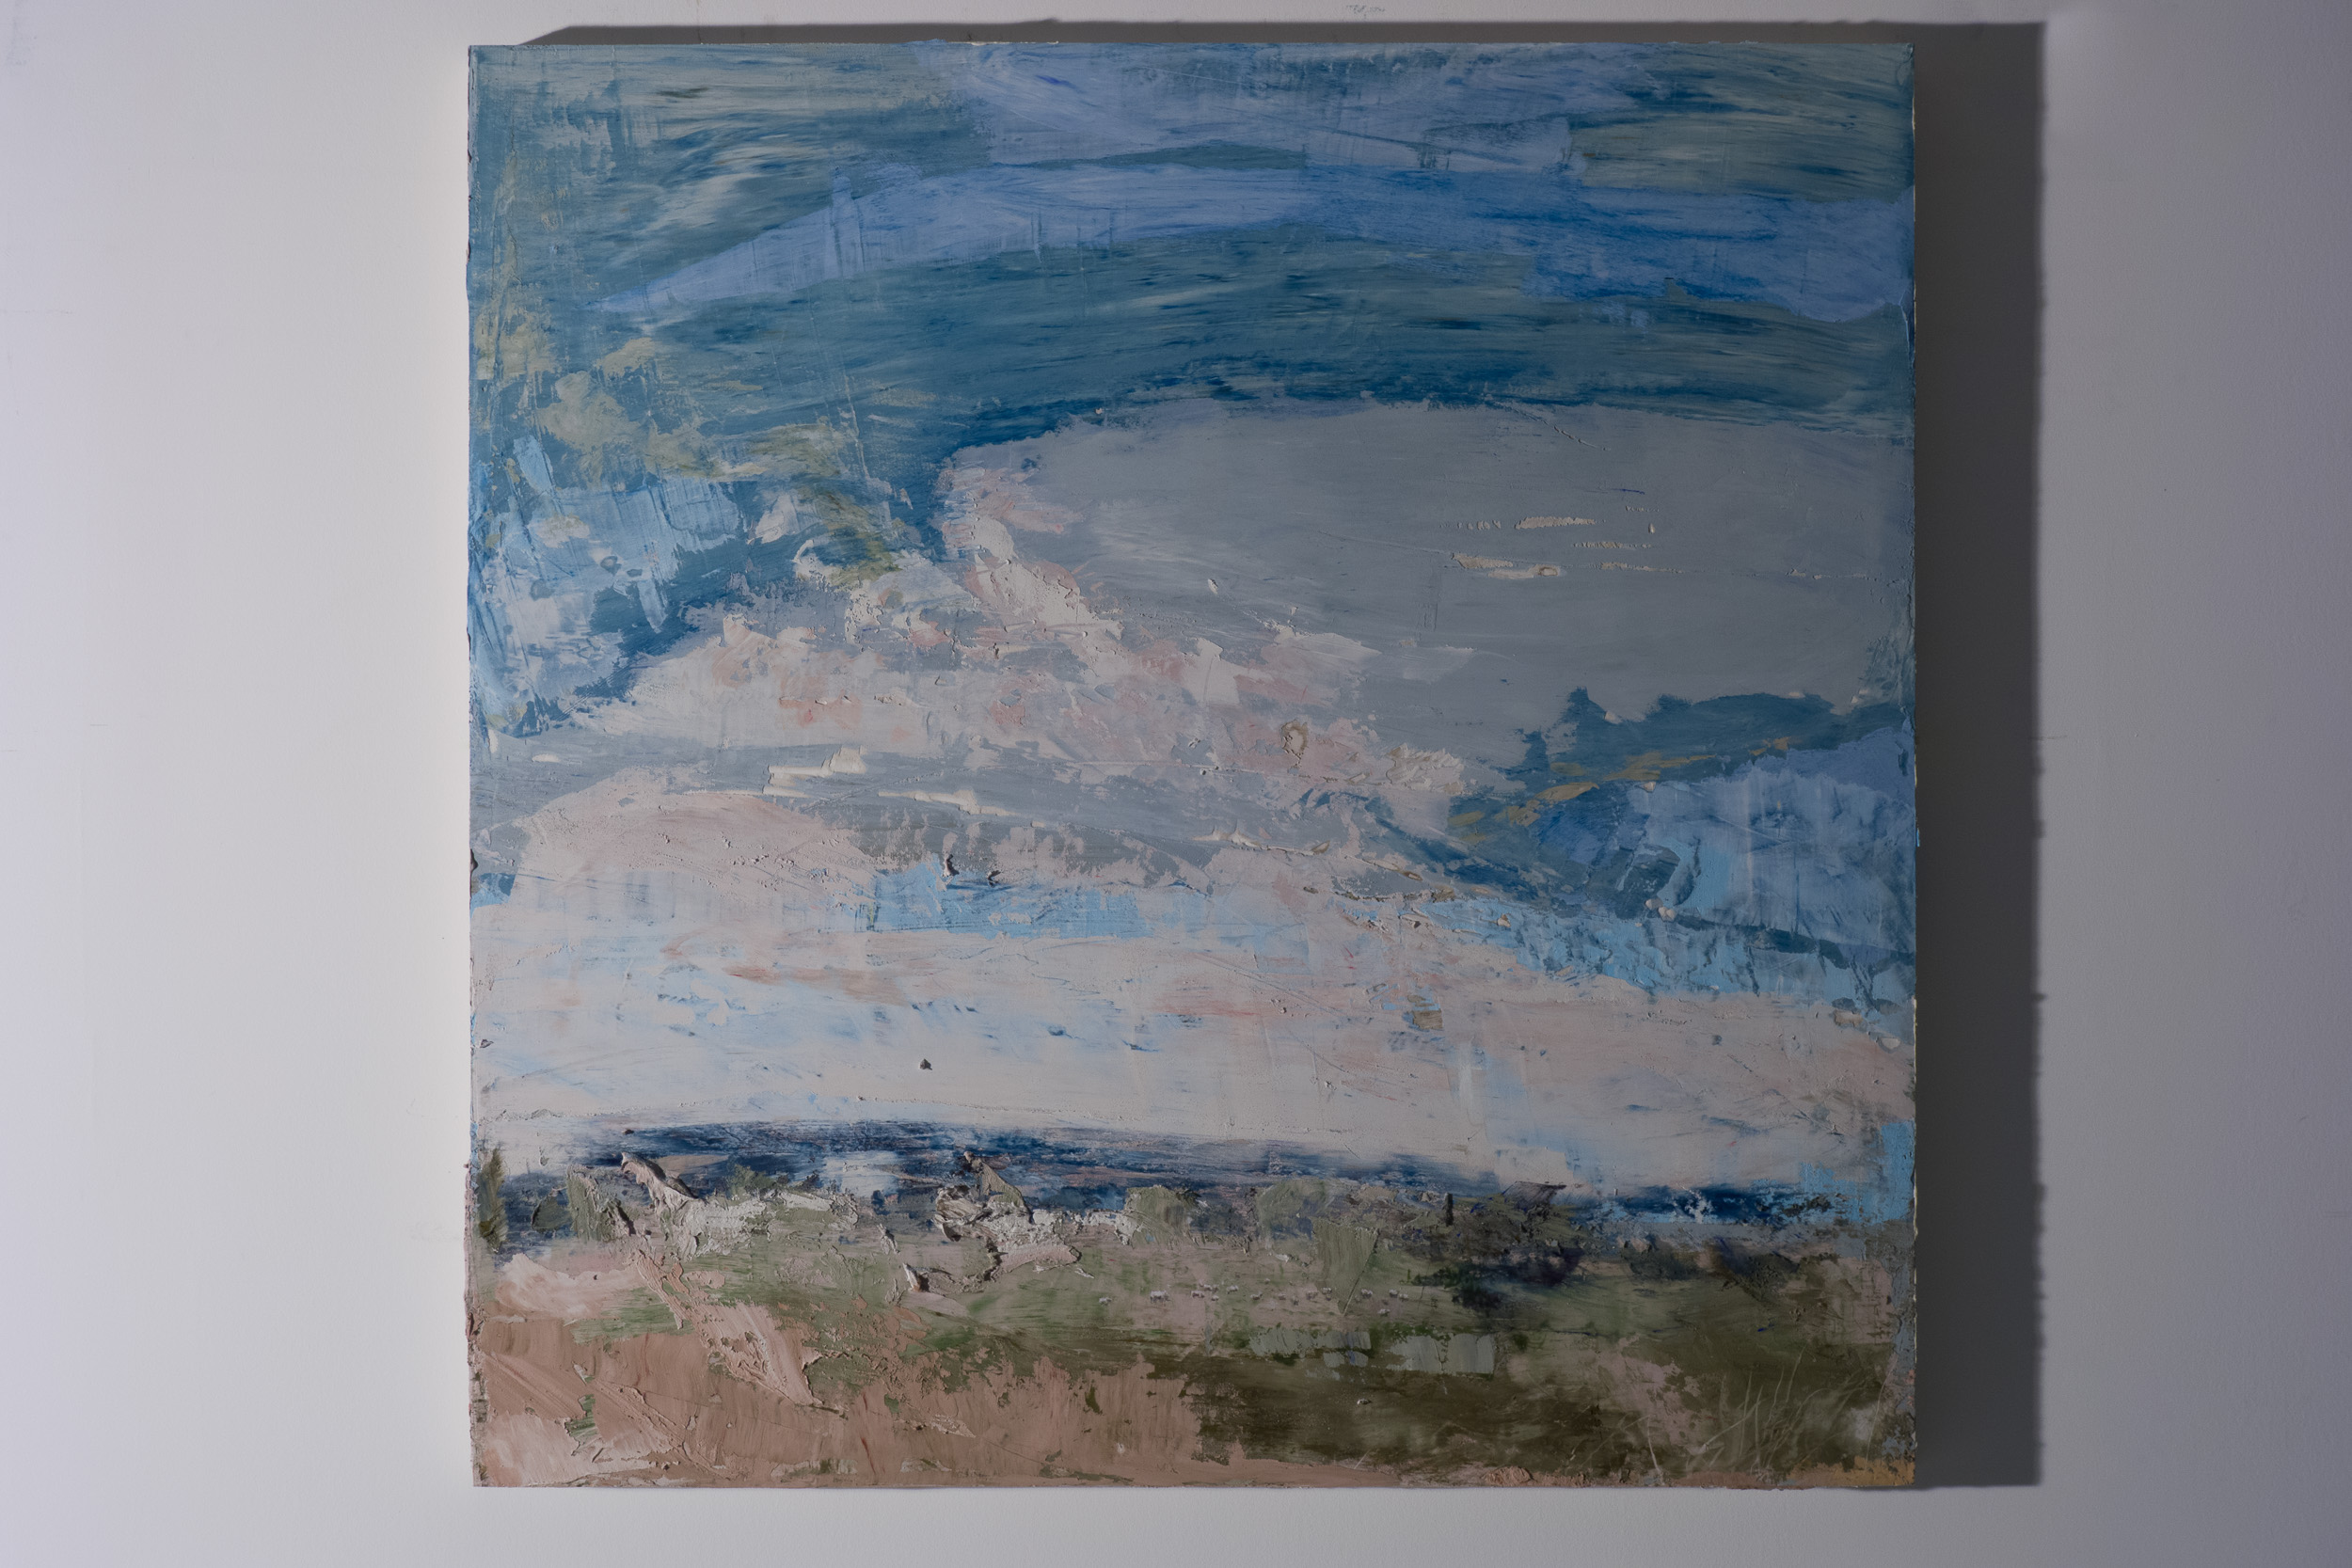 Shelley Vanderbyl - A View From Slightly Higher (Side Light) - 2016 - Fresco on Panel - 36x36.jpg